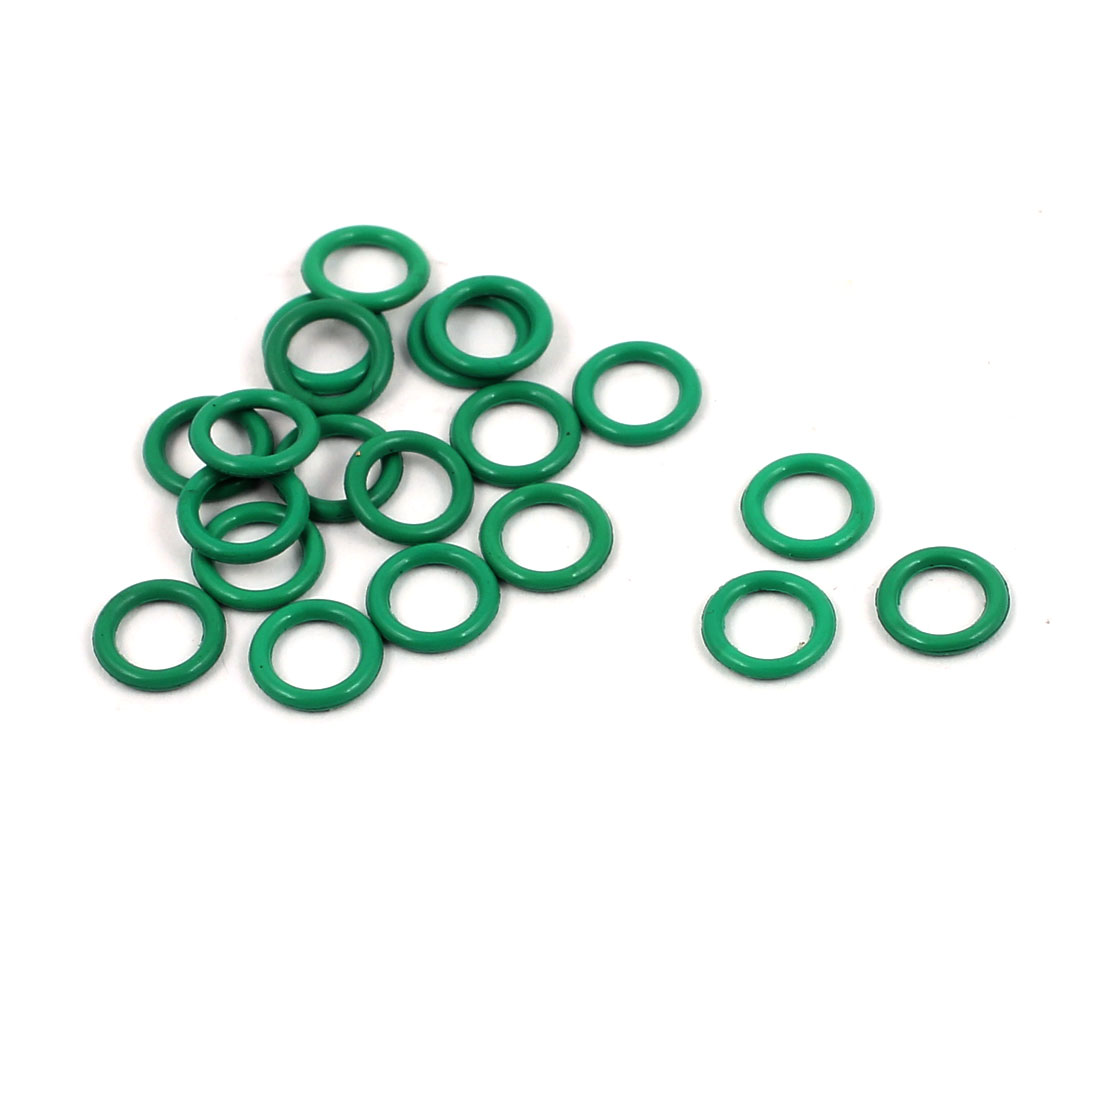 20Pcs 6mm x 1mm FKM O-rings Heat Resistant Sealing Ring Grommets Green